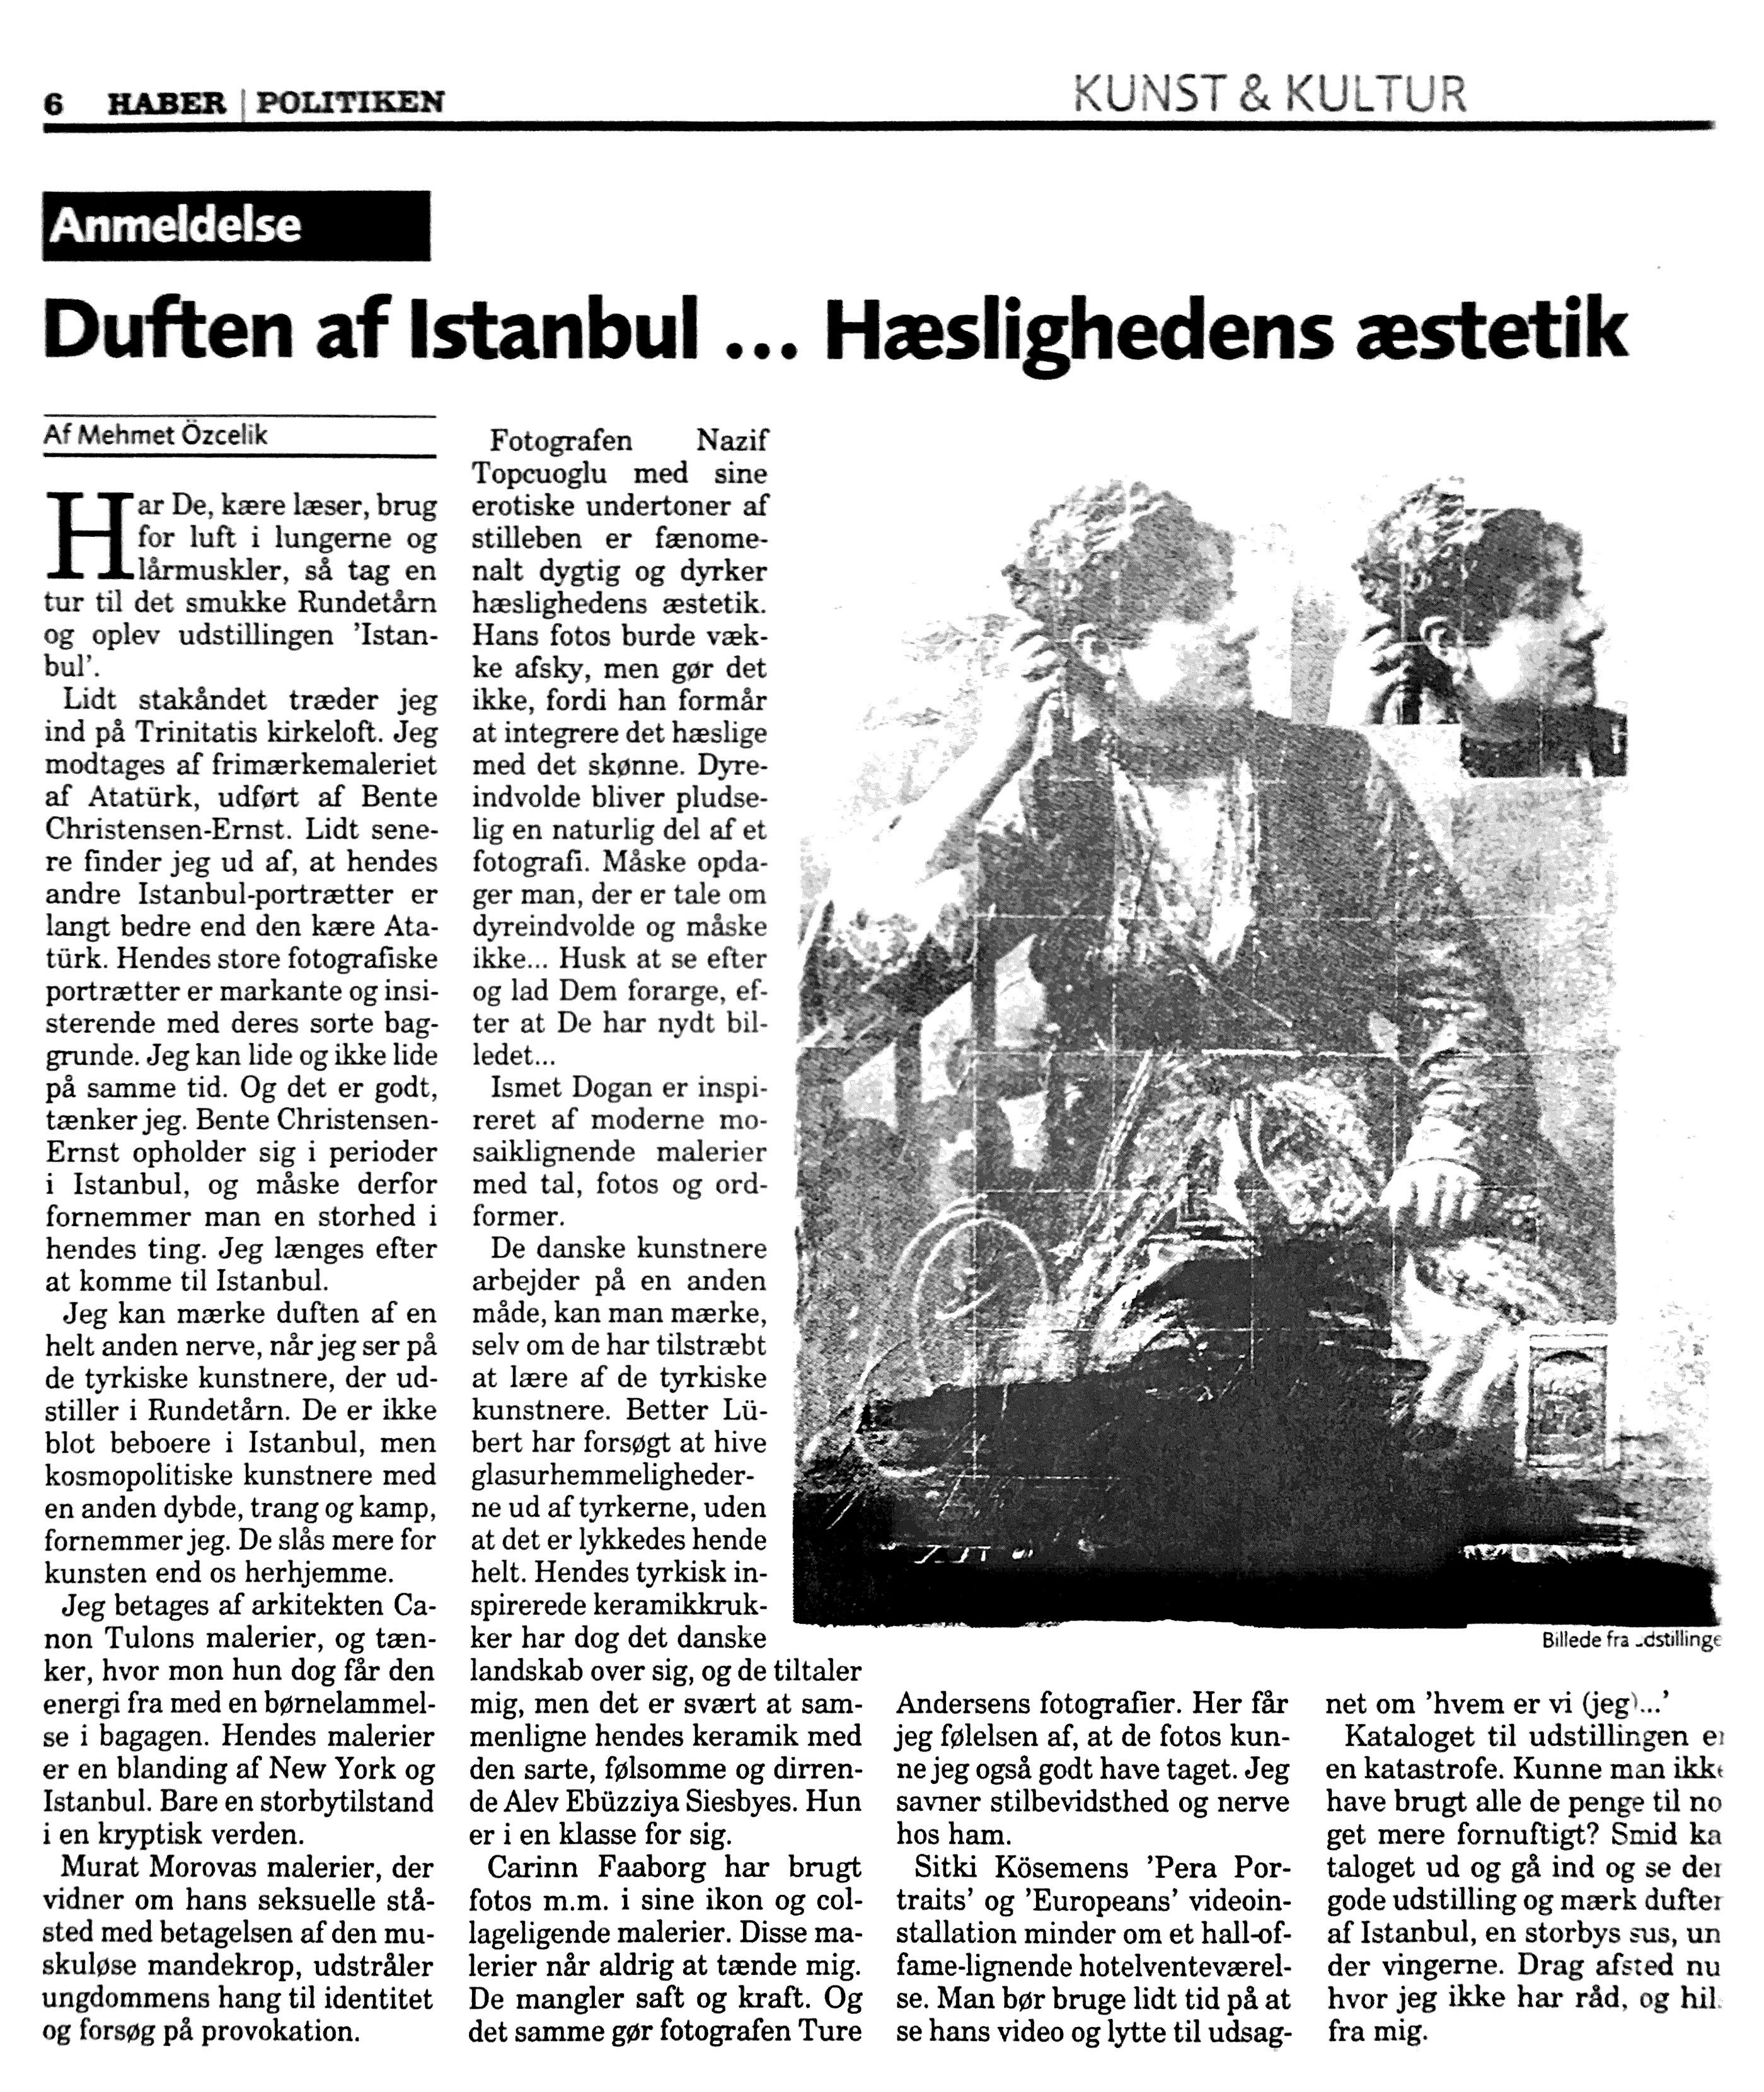 2002_Politiken2